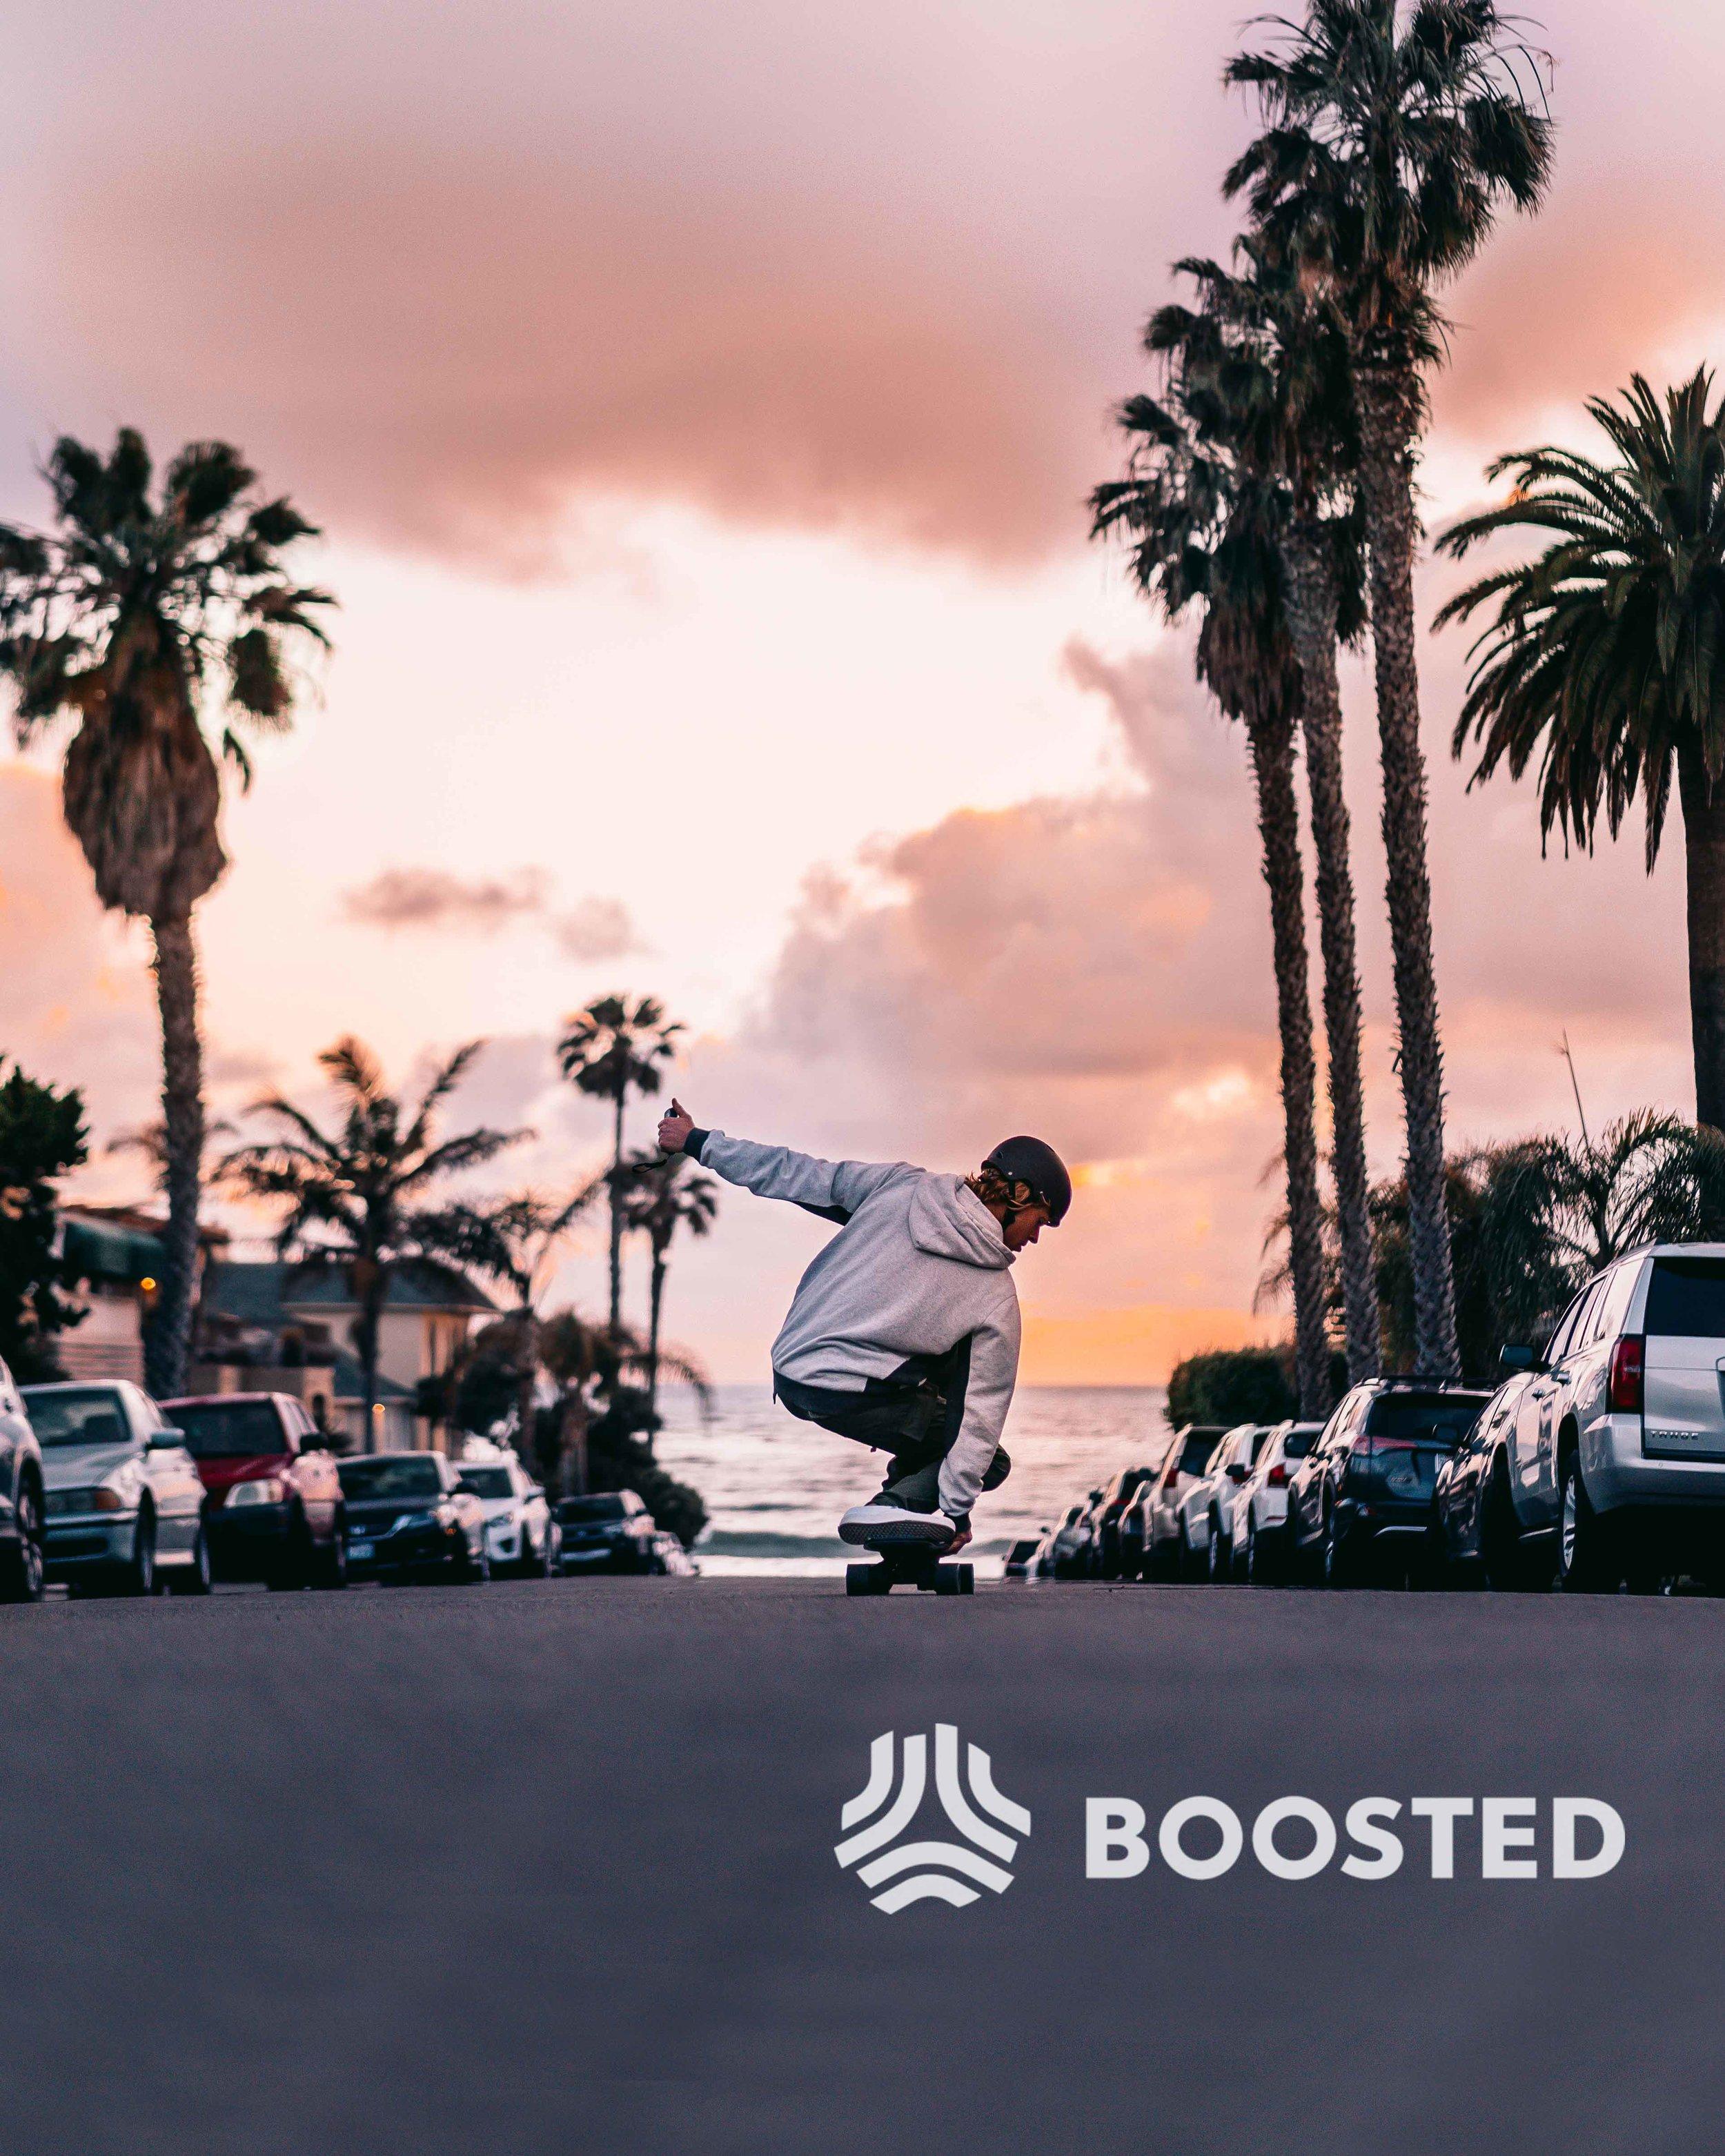 boosted_board_logo.jpg